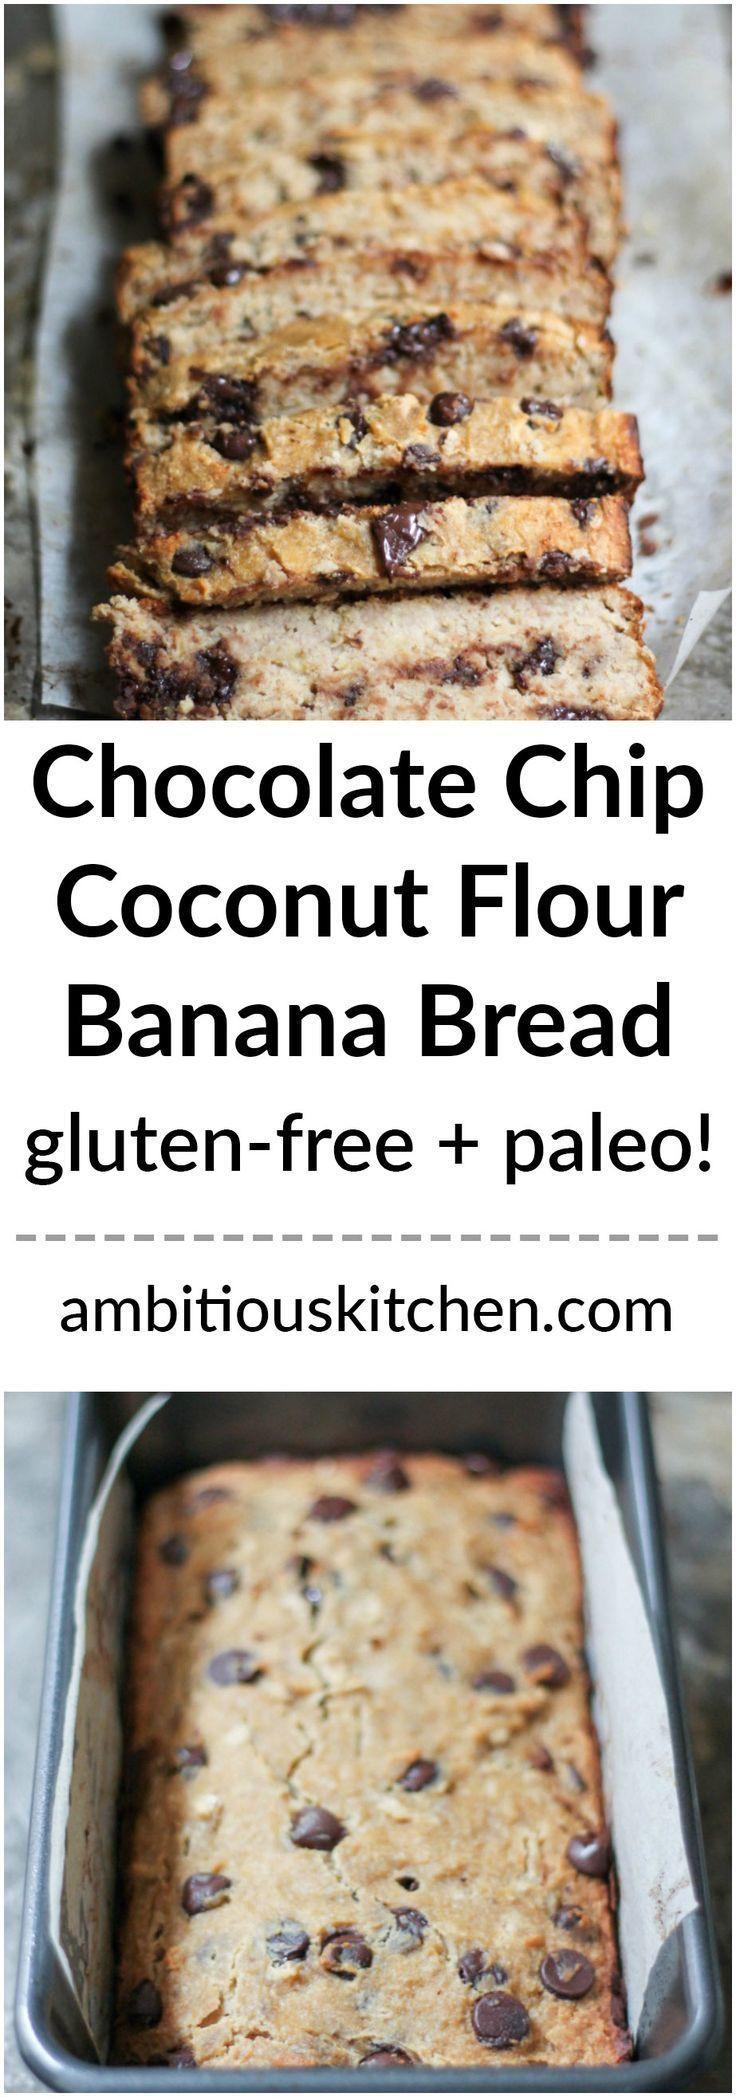 Healthy Banana Bread No Flour  Best 25 Healthy recipes ideas on Pinterest